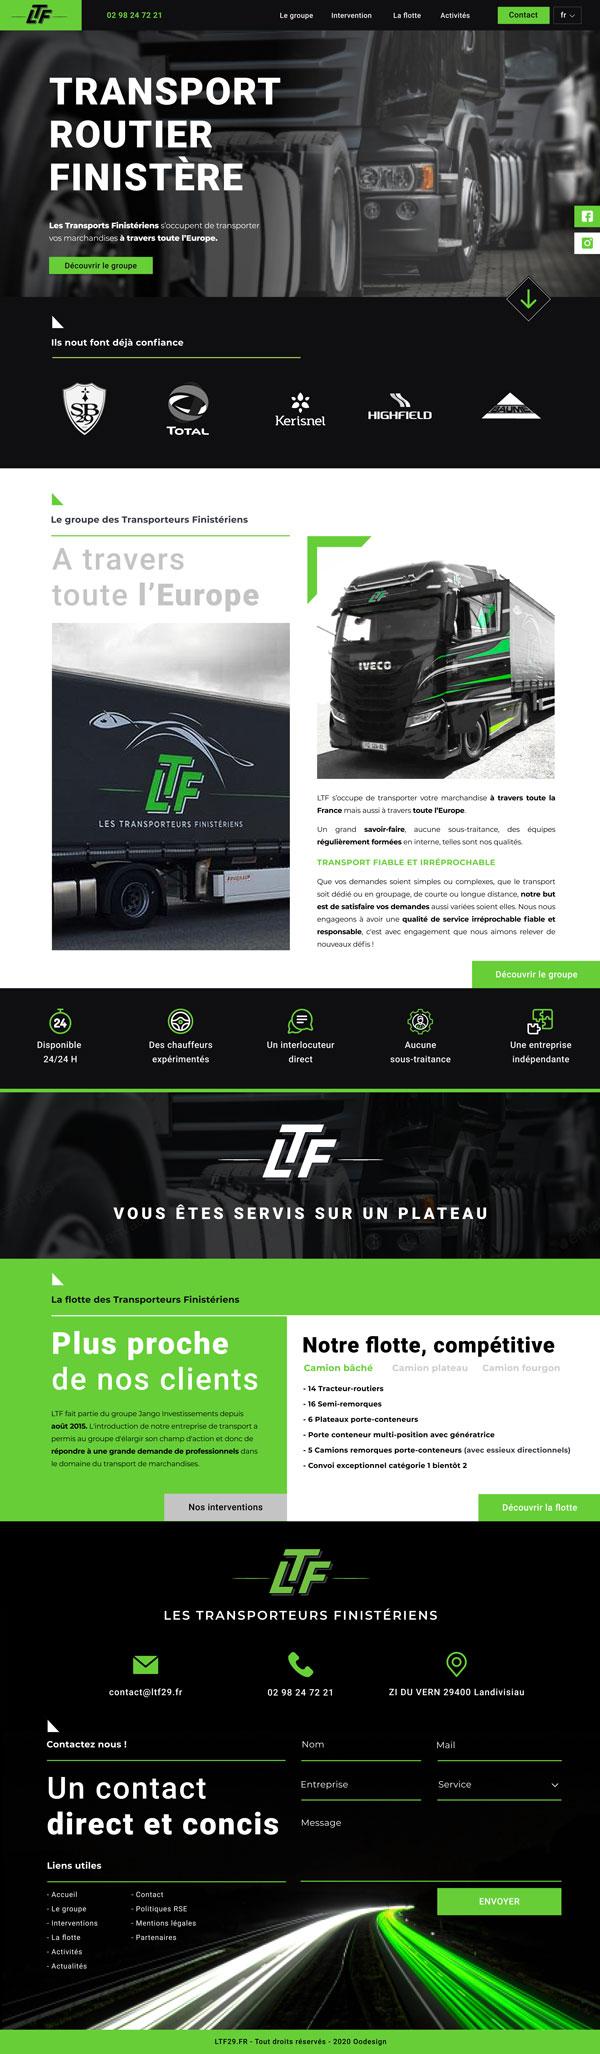 webdesign original site vitrine ltg omgo branding